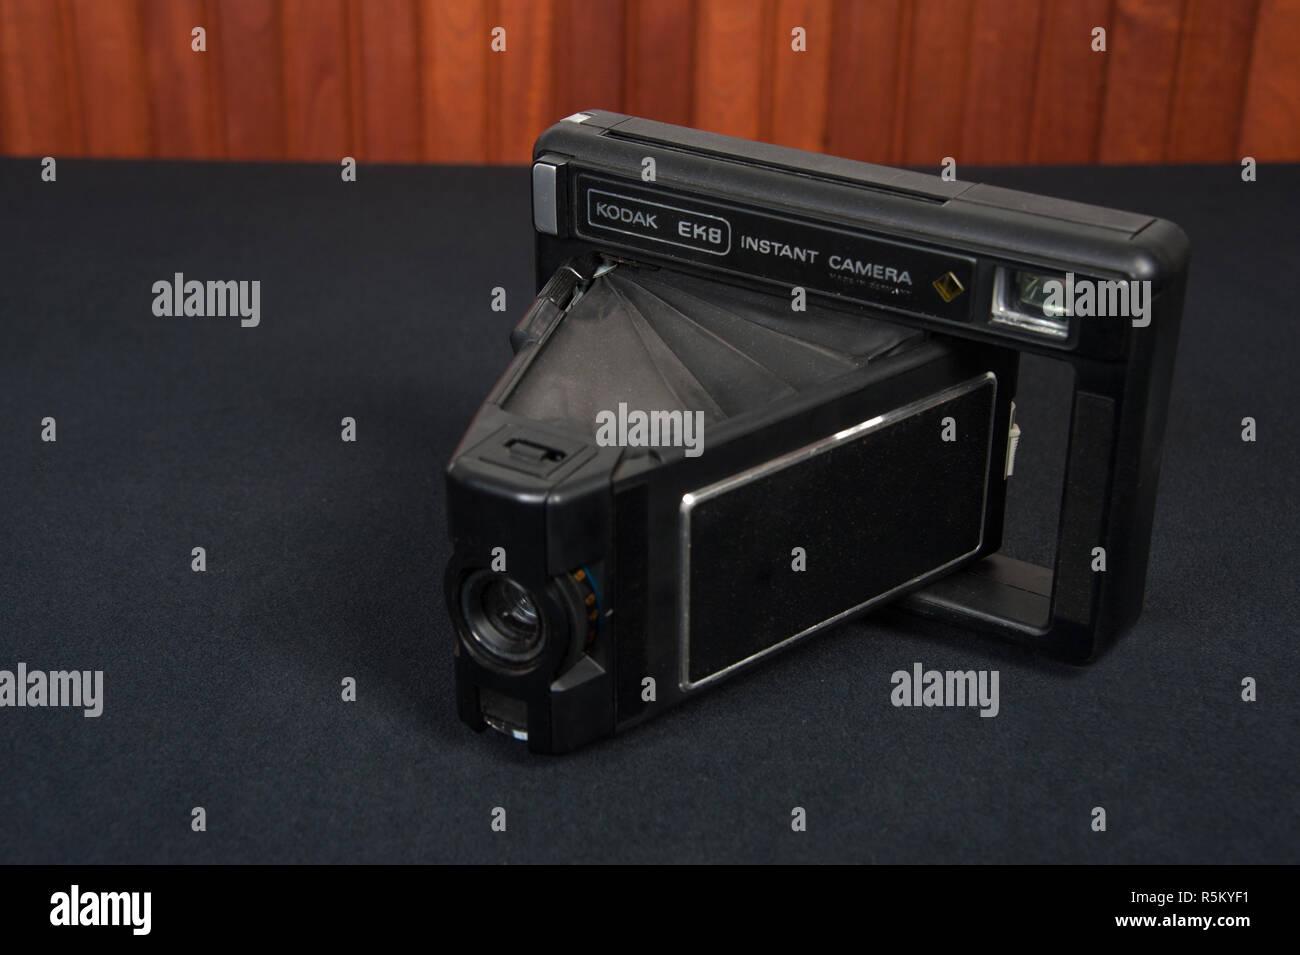 Kodak model EK8, one of Kodak's early instant cameras - Stock Image